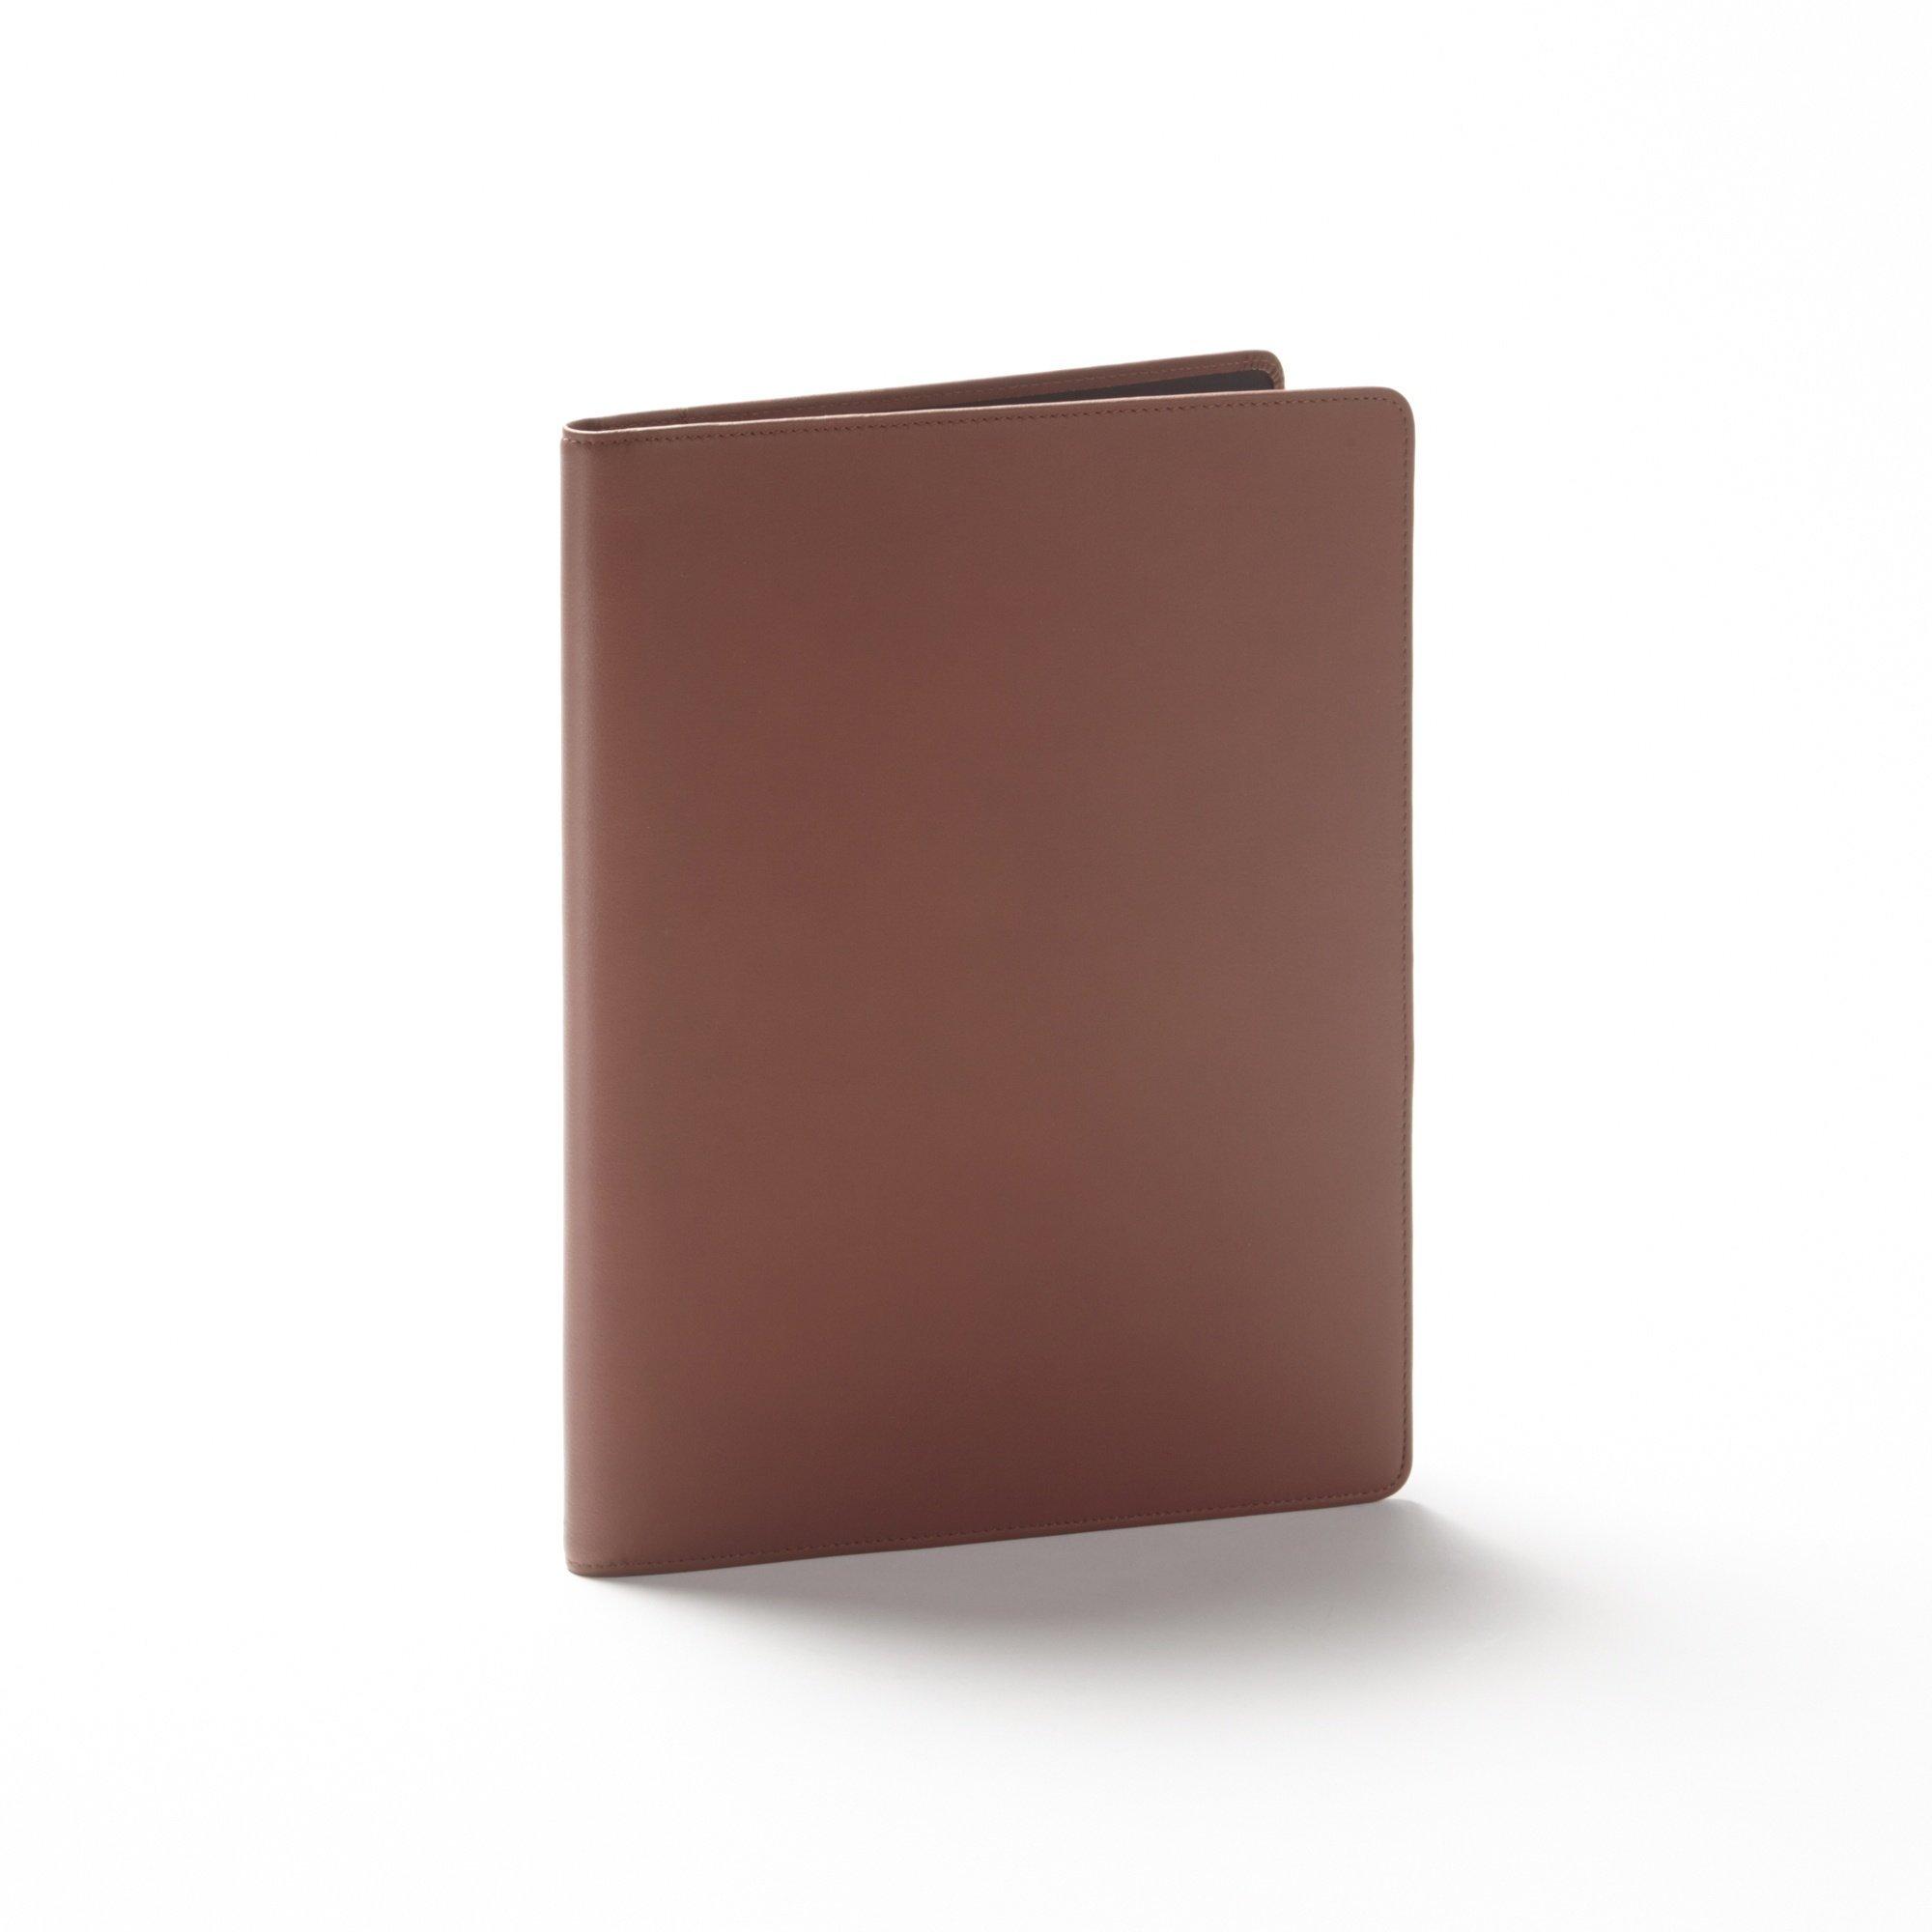 Leather Folder - Full Grain Leather - Cognac (brown)